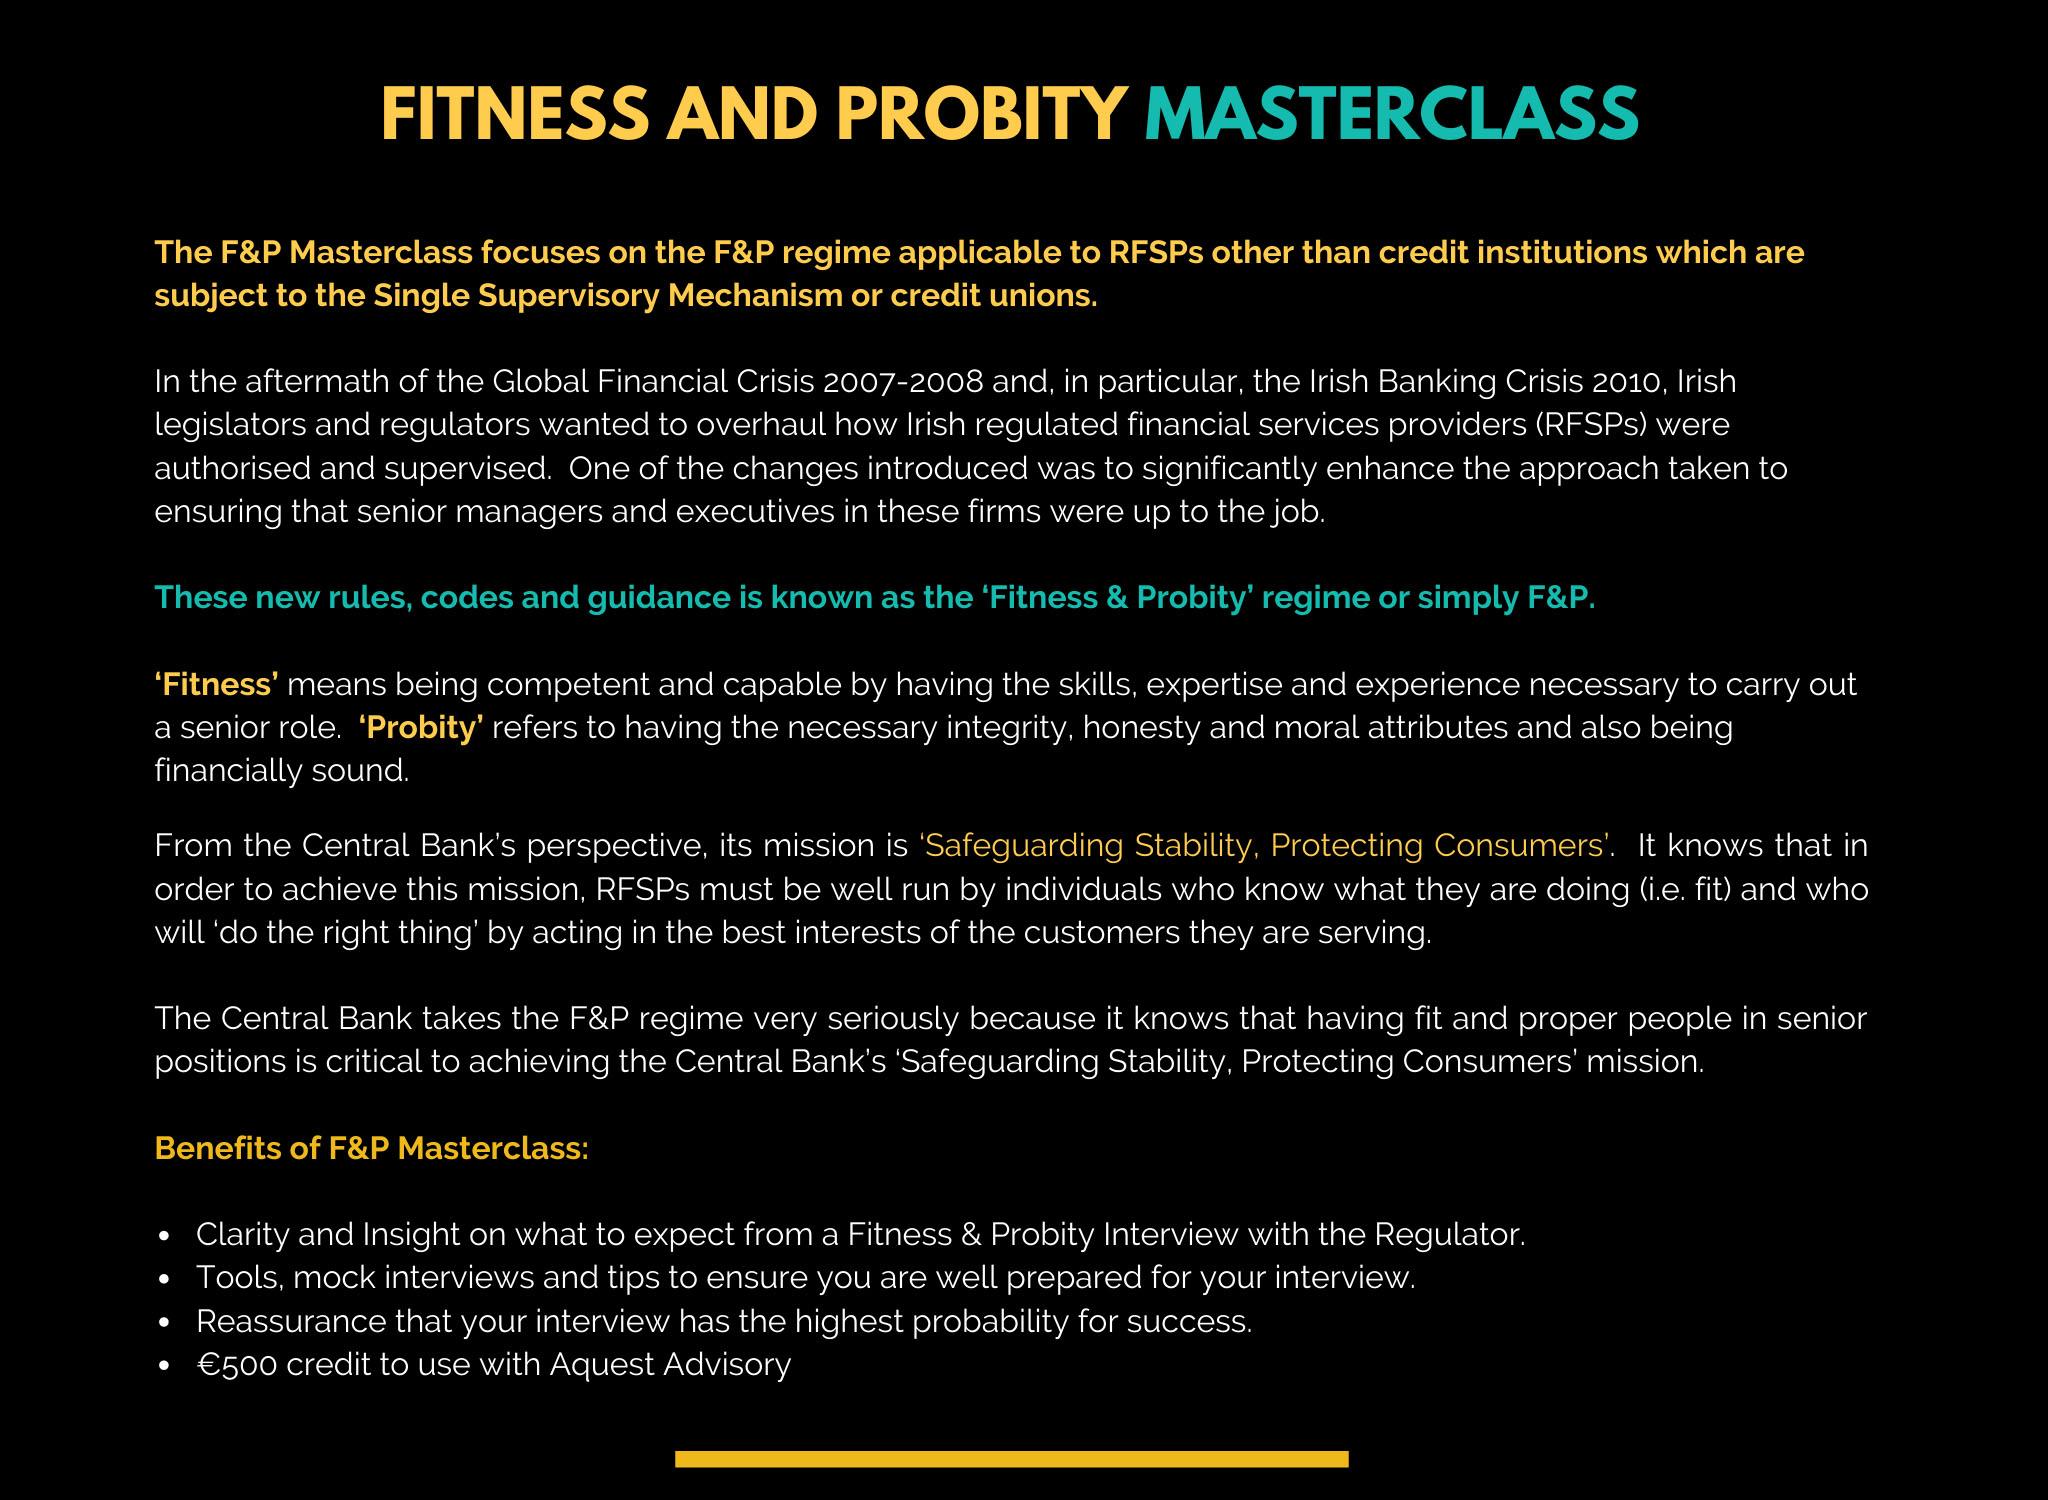 F&P Masterclass